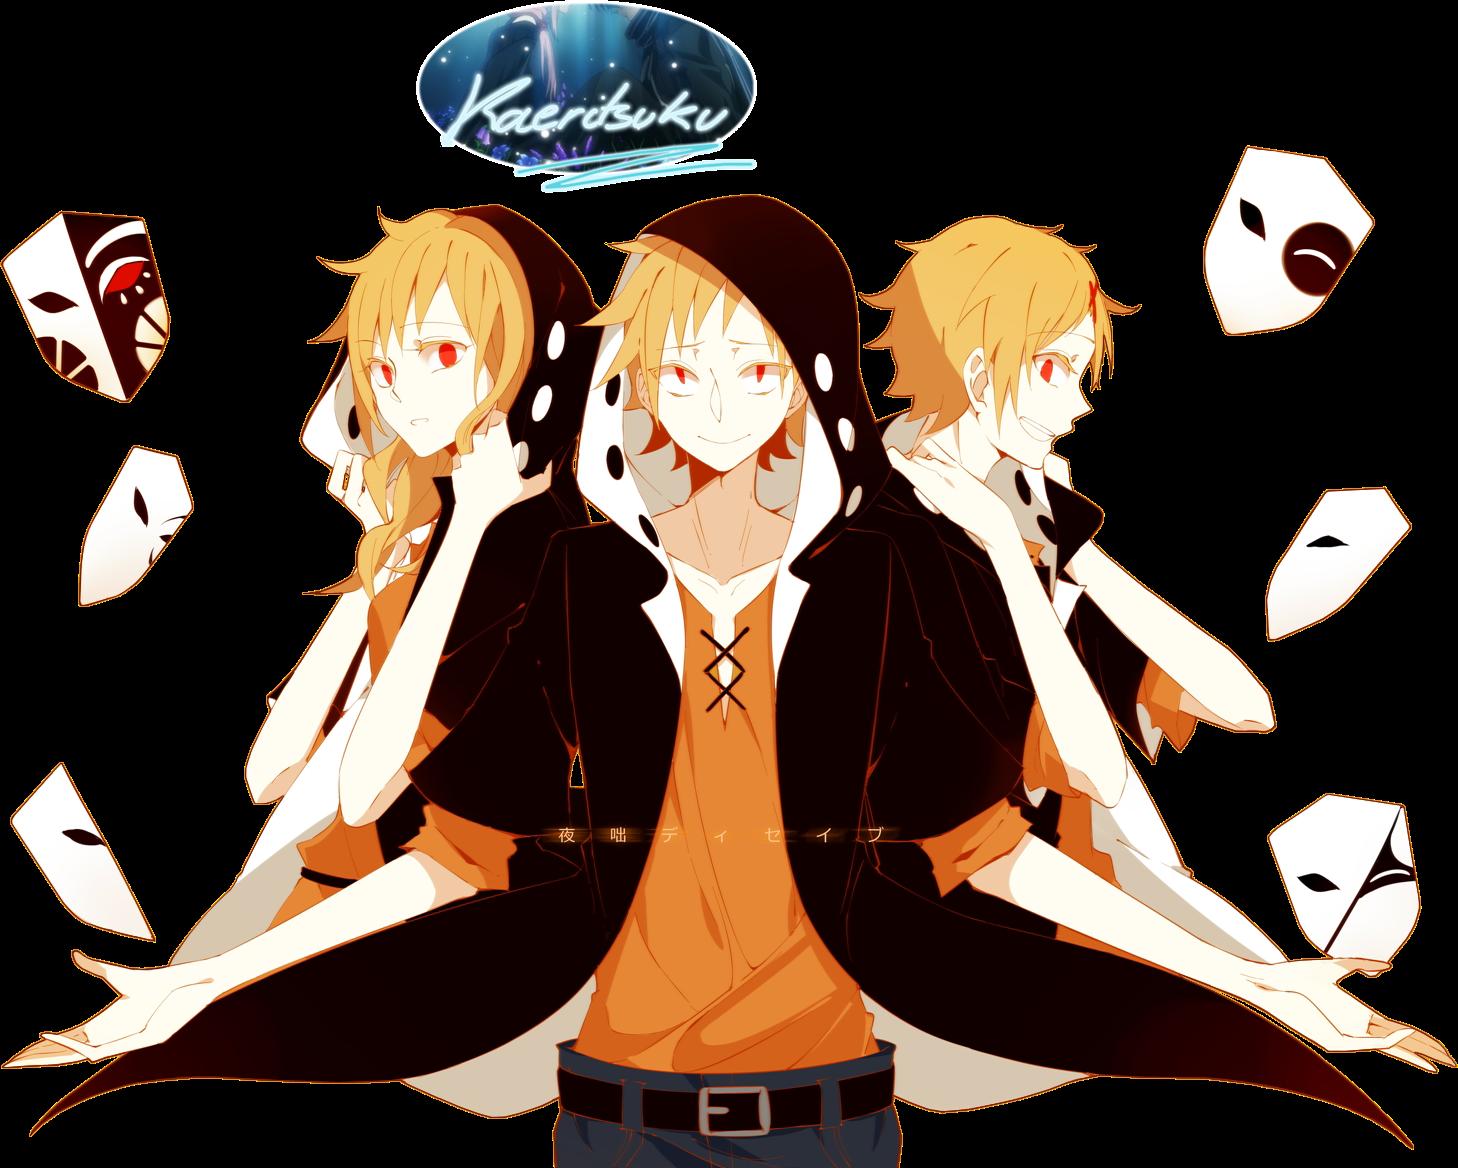 Renders anime KagerouProjectShuuyaKanofull